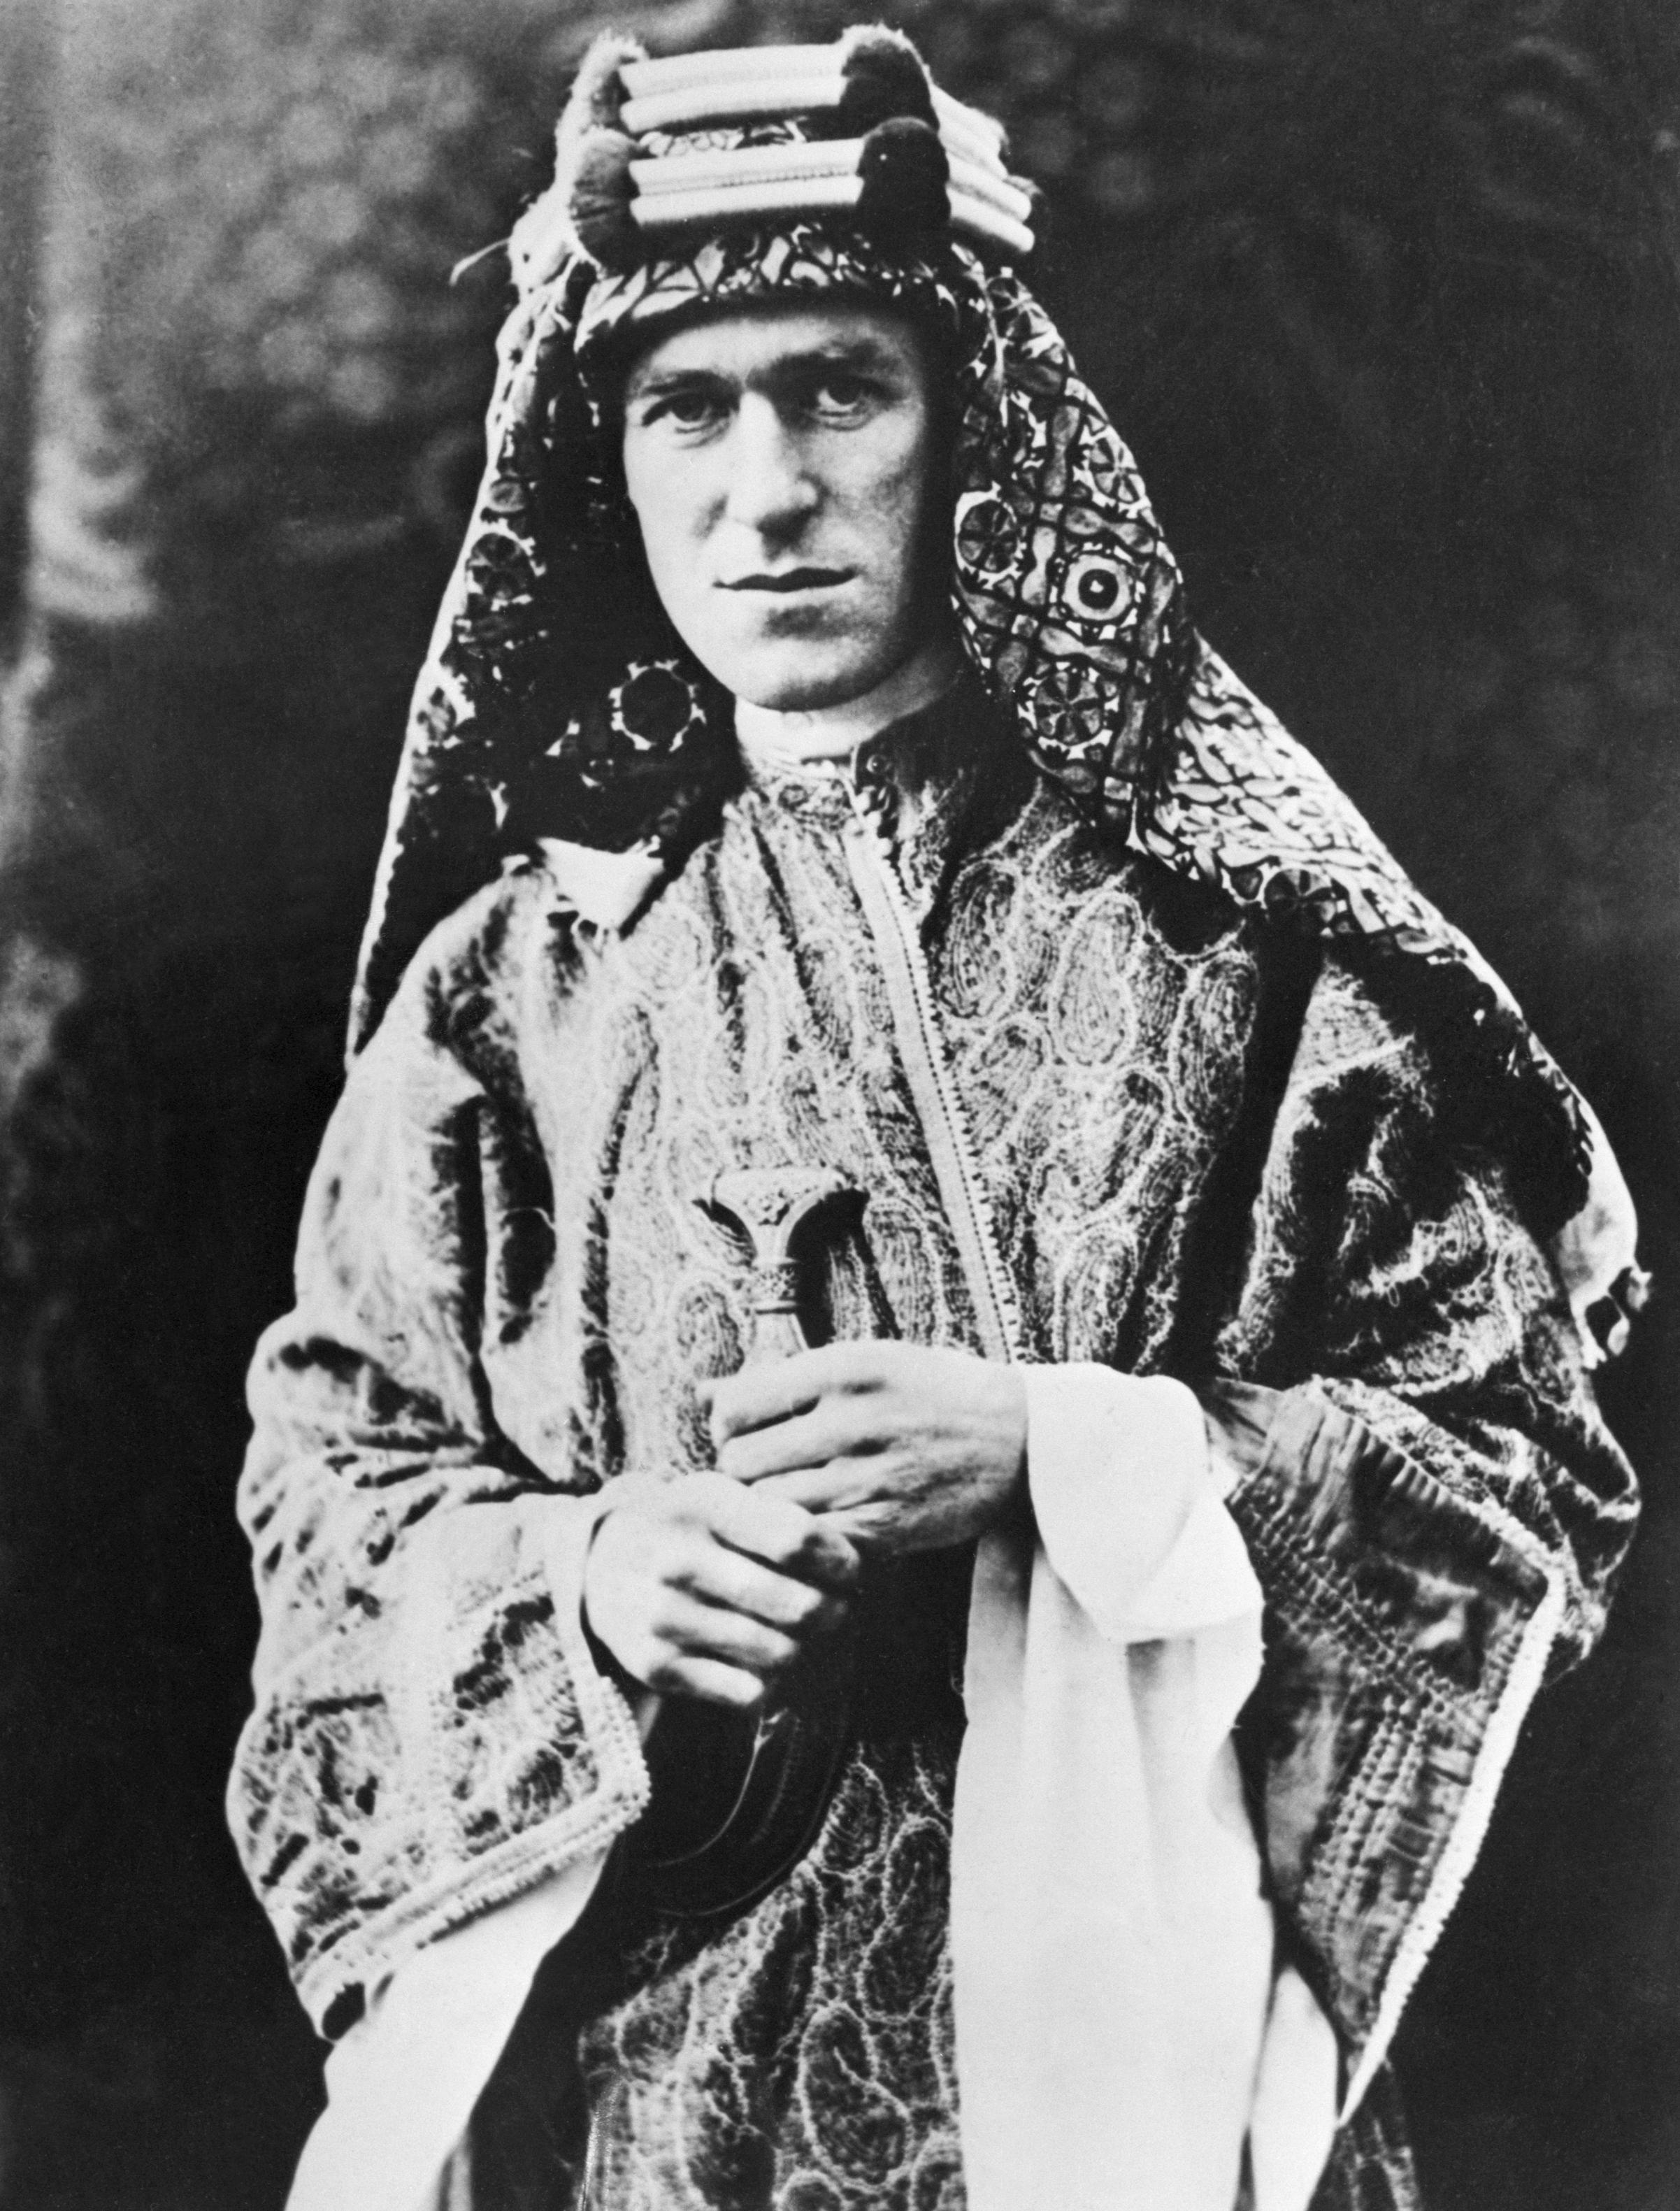 Lawrence of Arabia in 1927, dressed in Arab clothing.